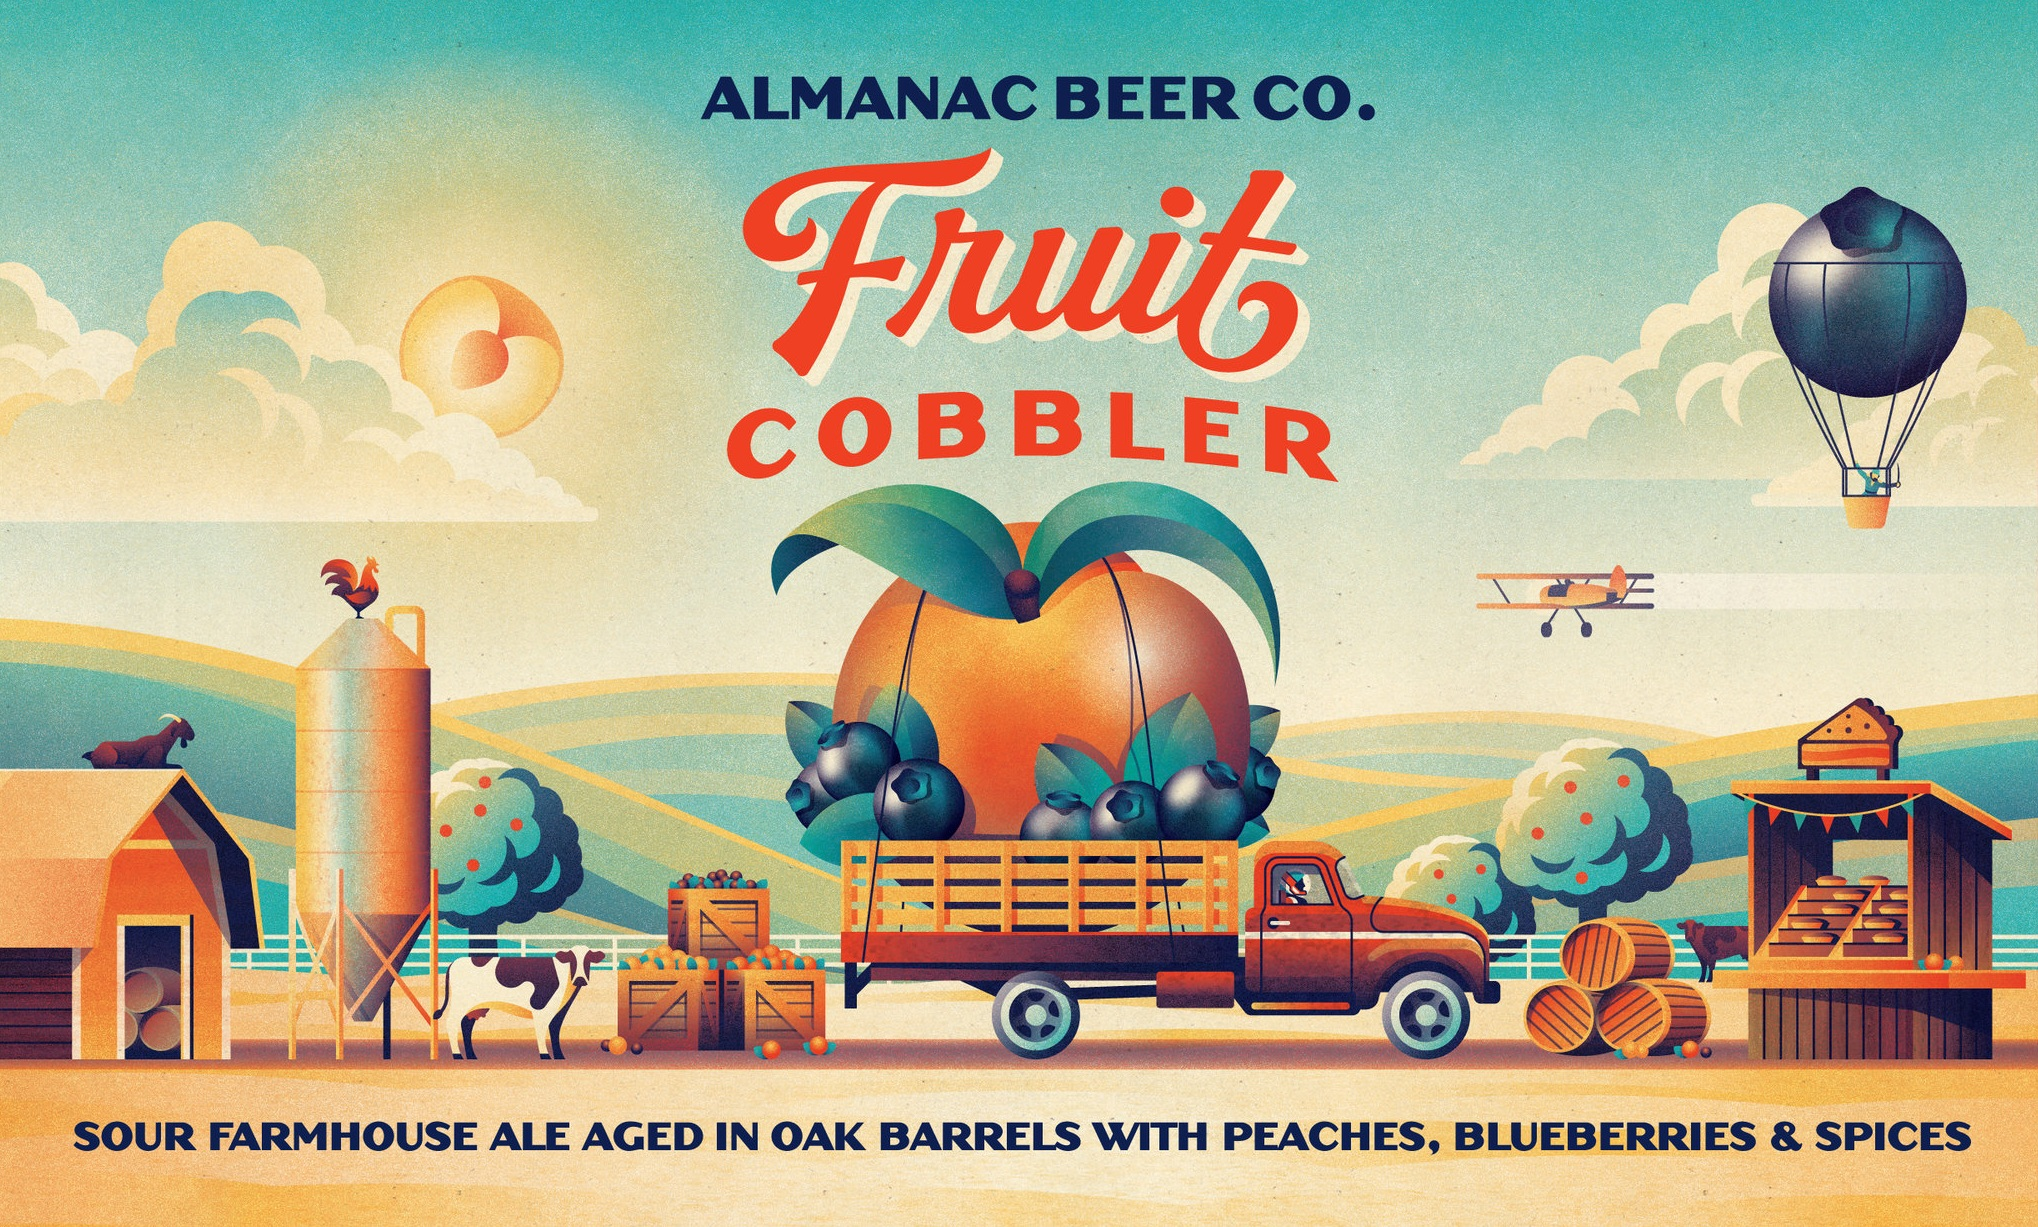 Almanac Beer Co. Fruit Cobbler label by DKNG